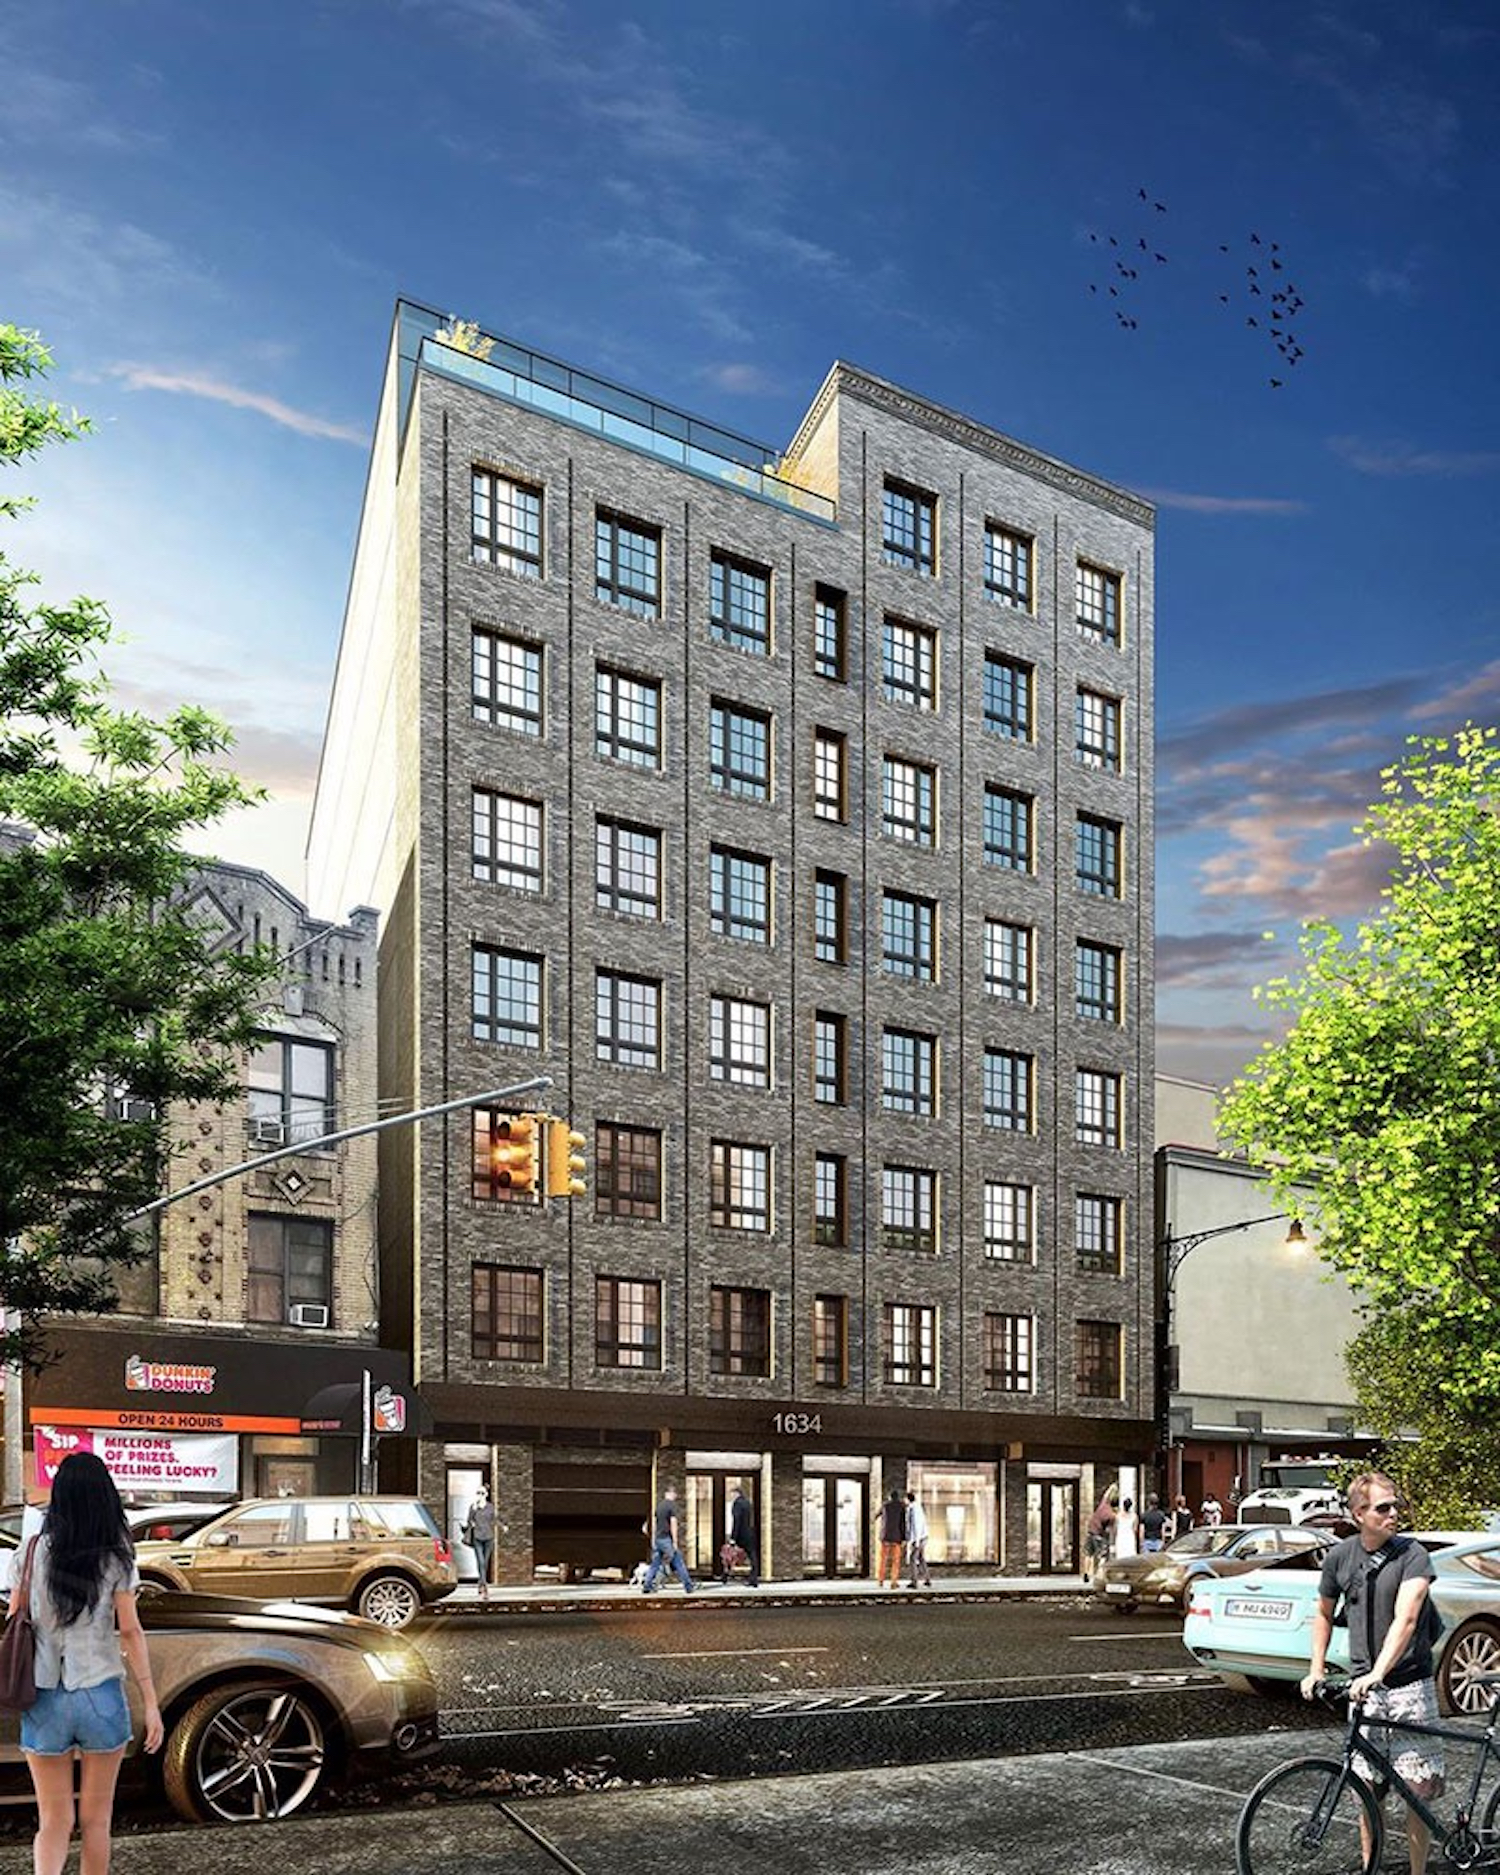 1634 Church Avenue in Flatbush, Brooklyn. All photos courtesy of NYC Housing Connect